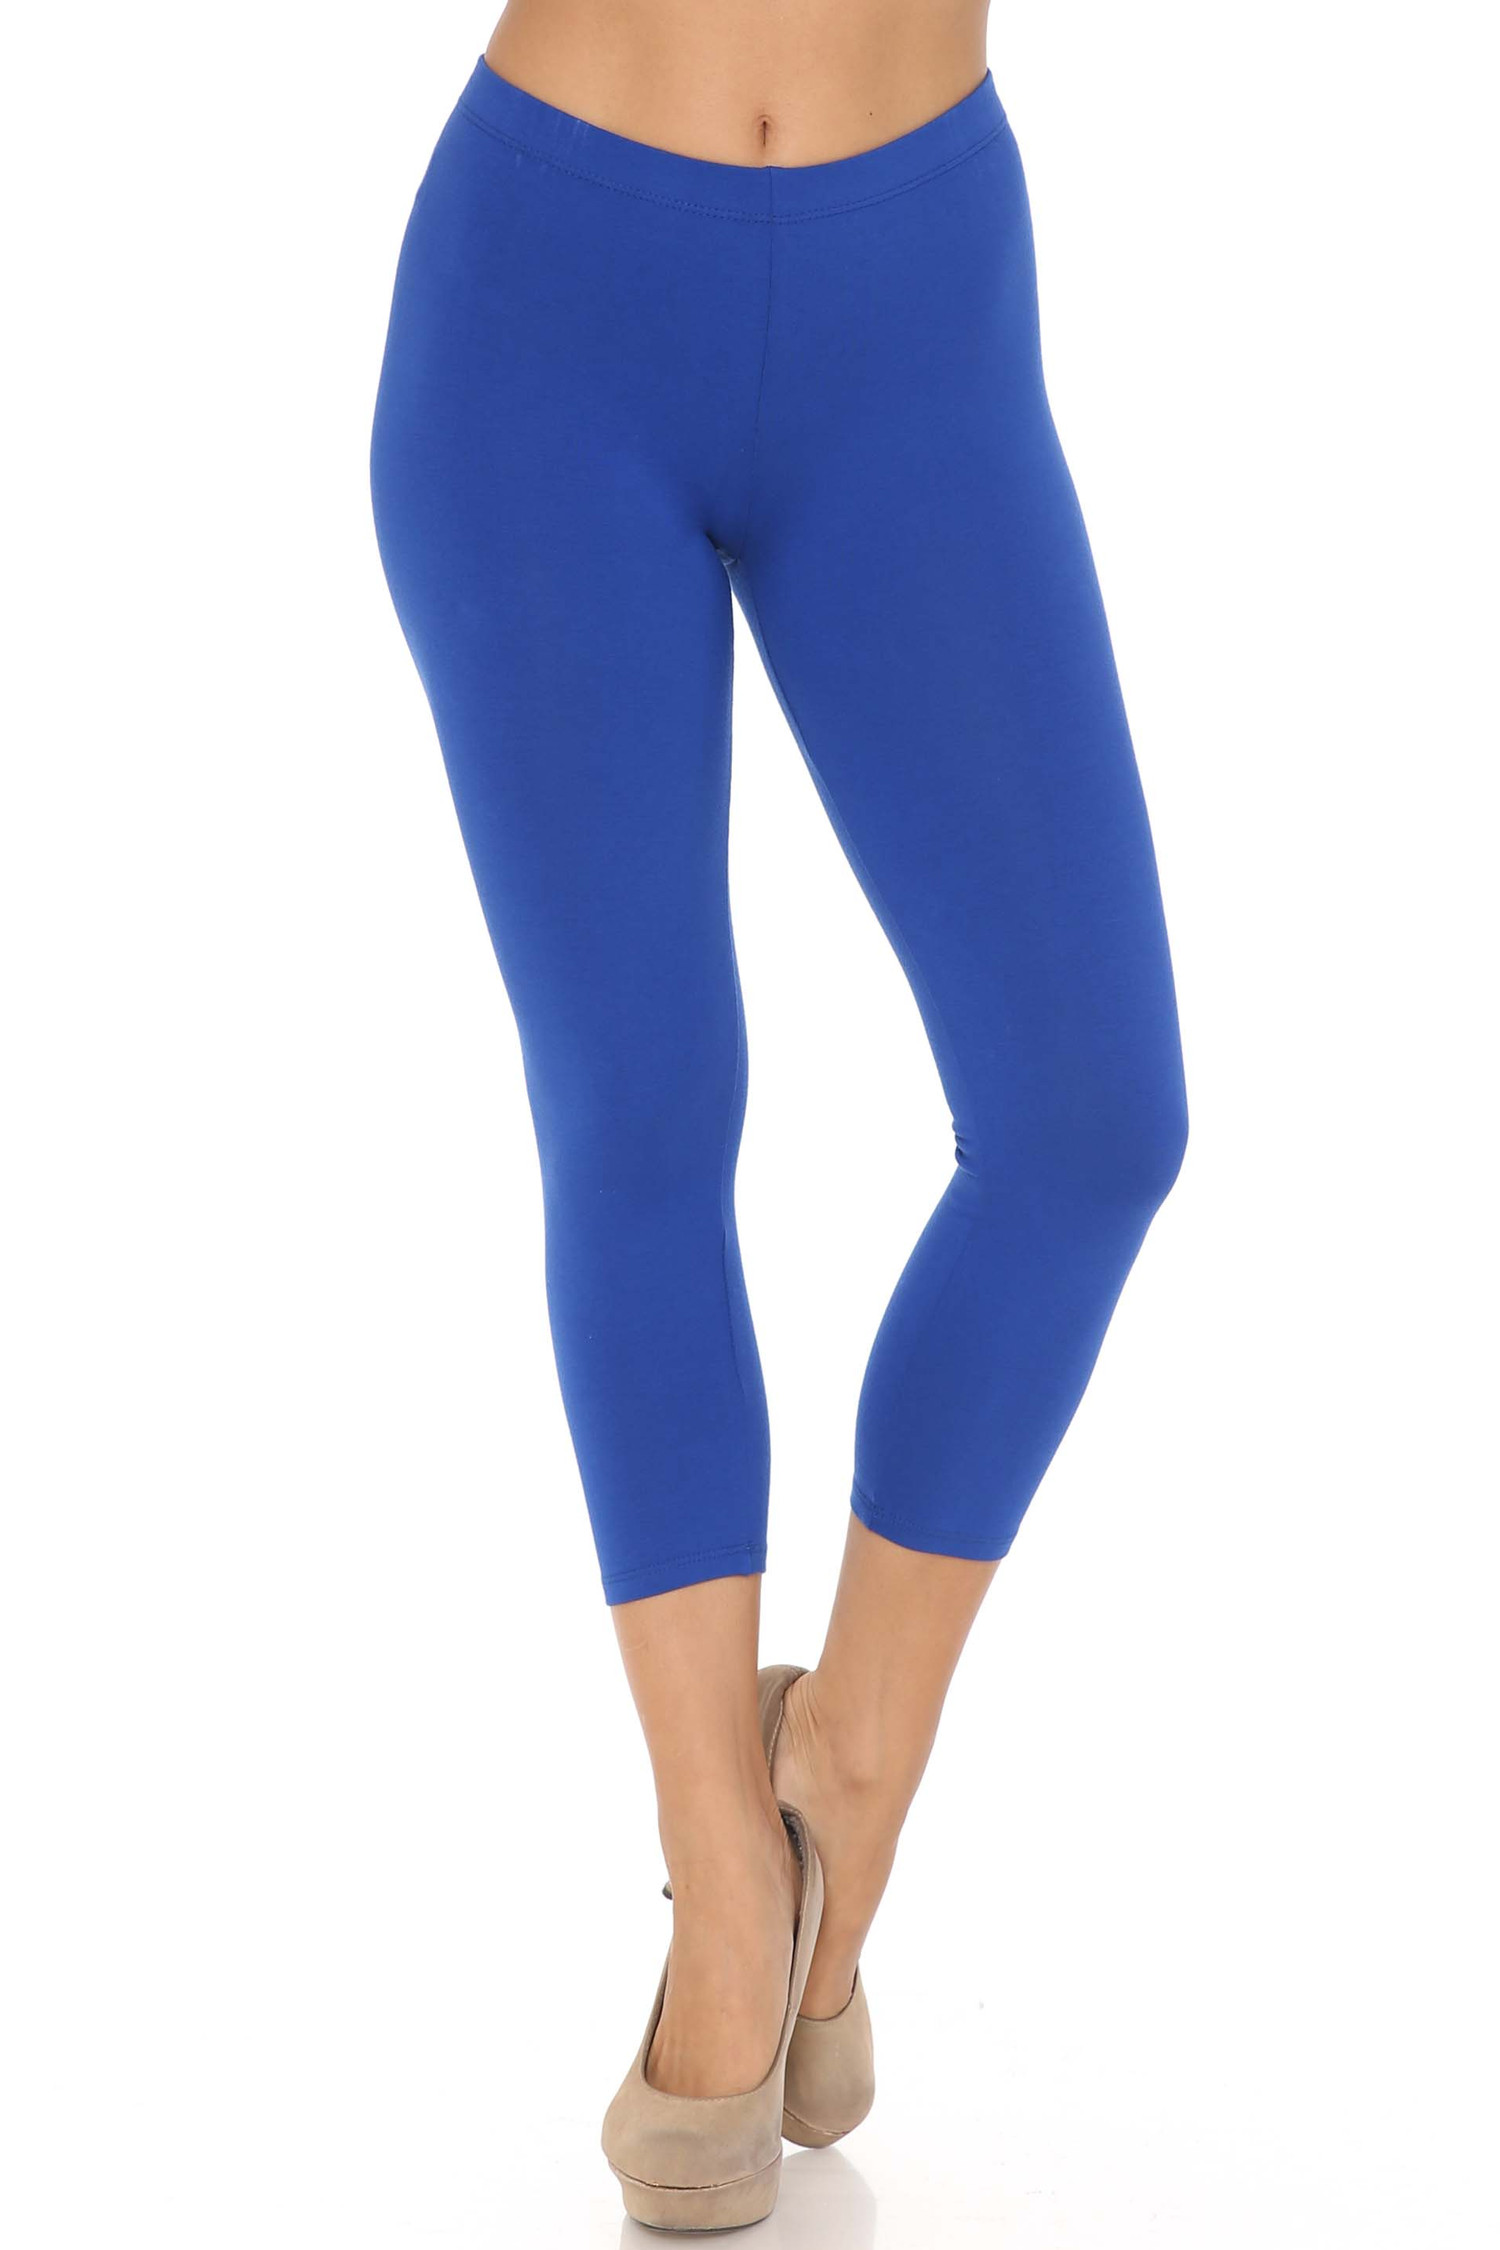 Front view of blue USA Cotton Capri Length Leggings